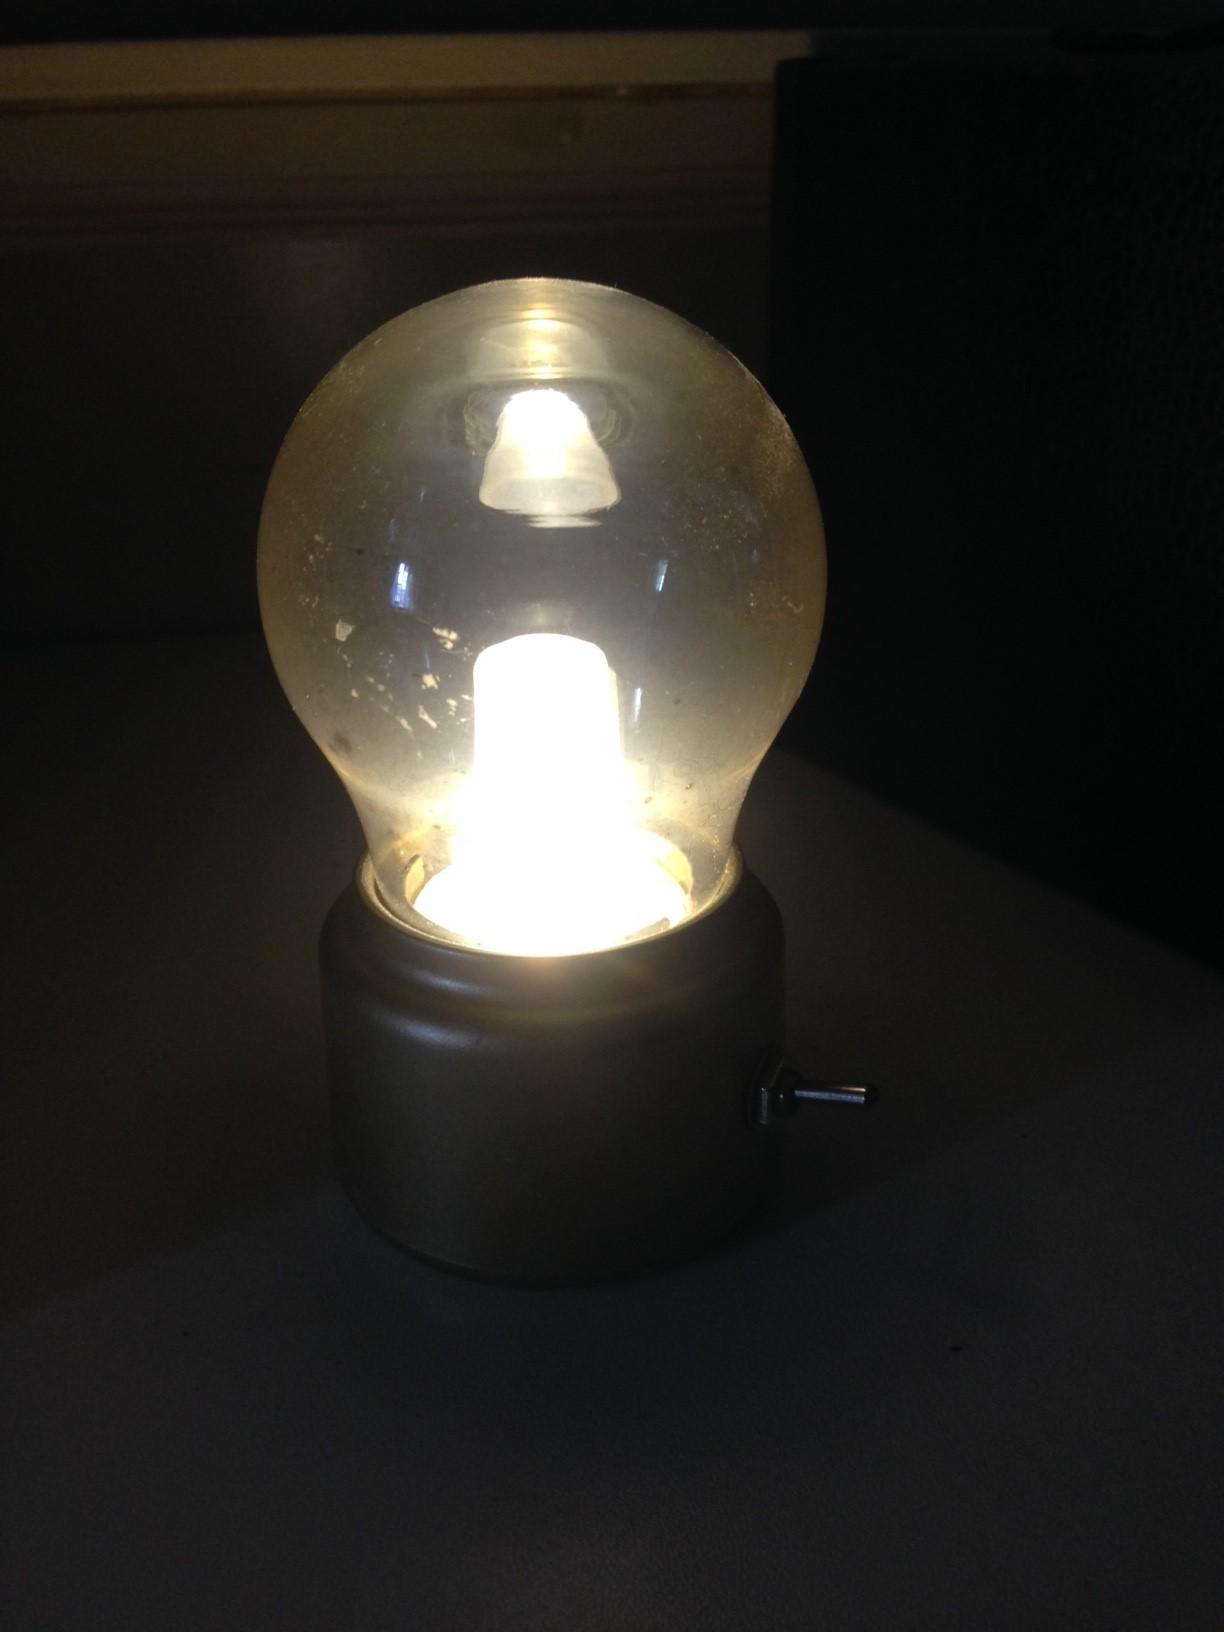 Amazon Com Ge 3in1 Led Power Failure Night Light Plugin